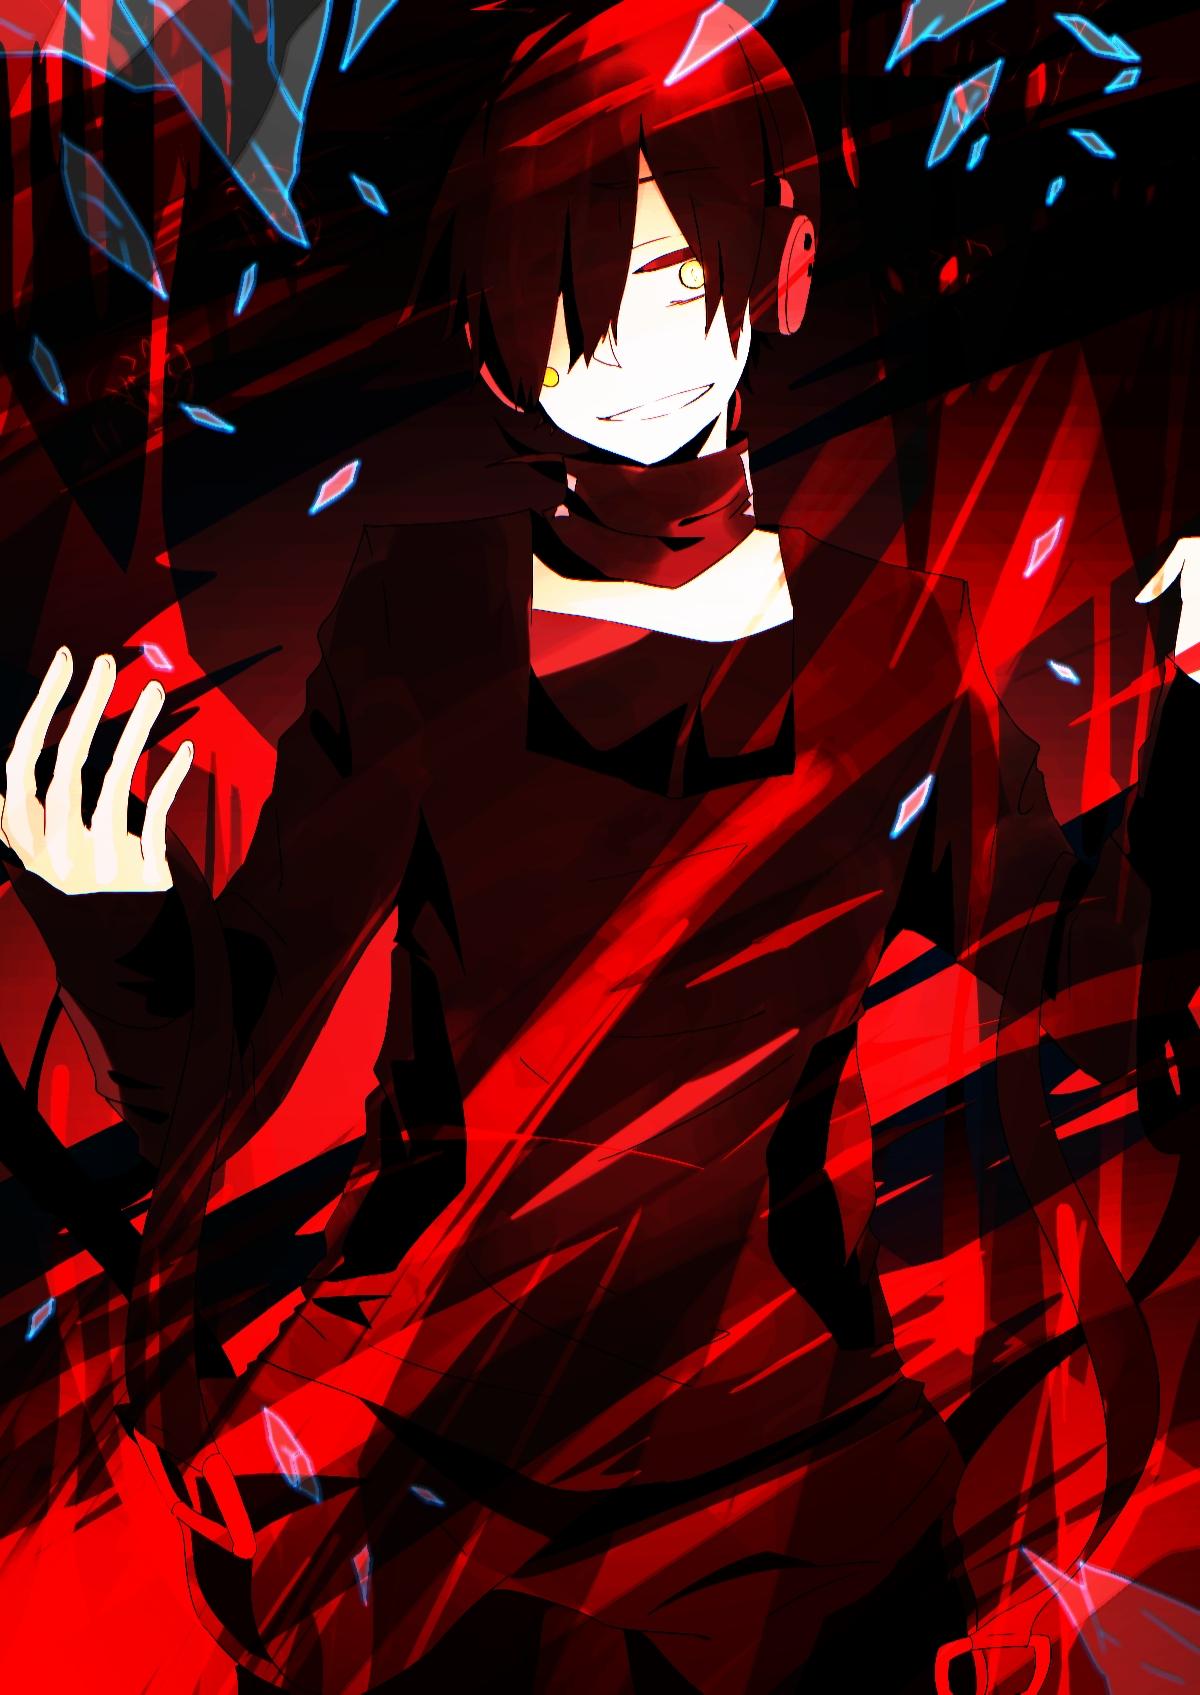 dark konoha kokonose quotkonohaquot haruka zerochan anime